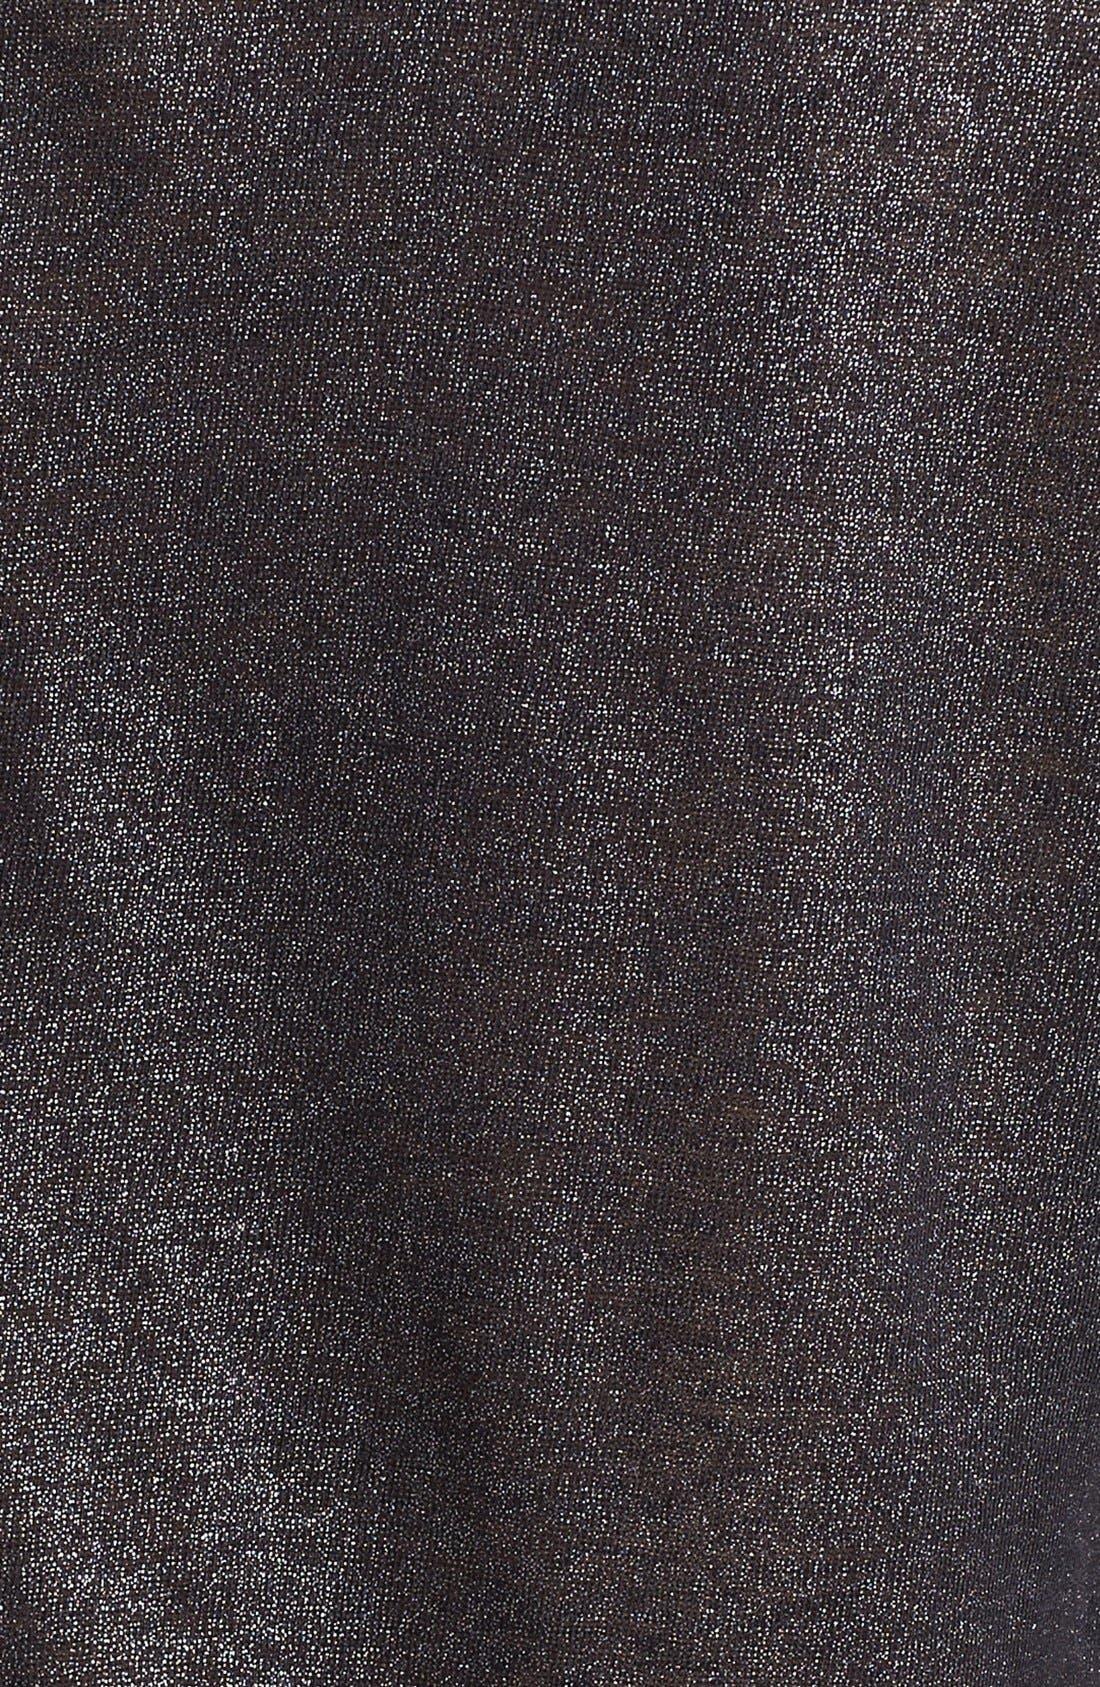 Alternate Image 3  - Joie 'Cyndi' Metallic Top